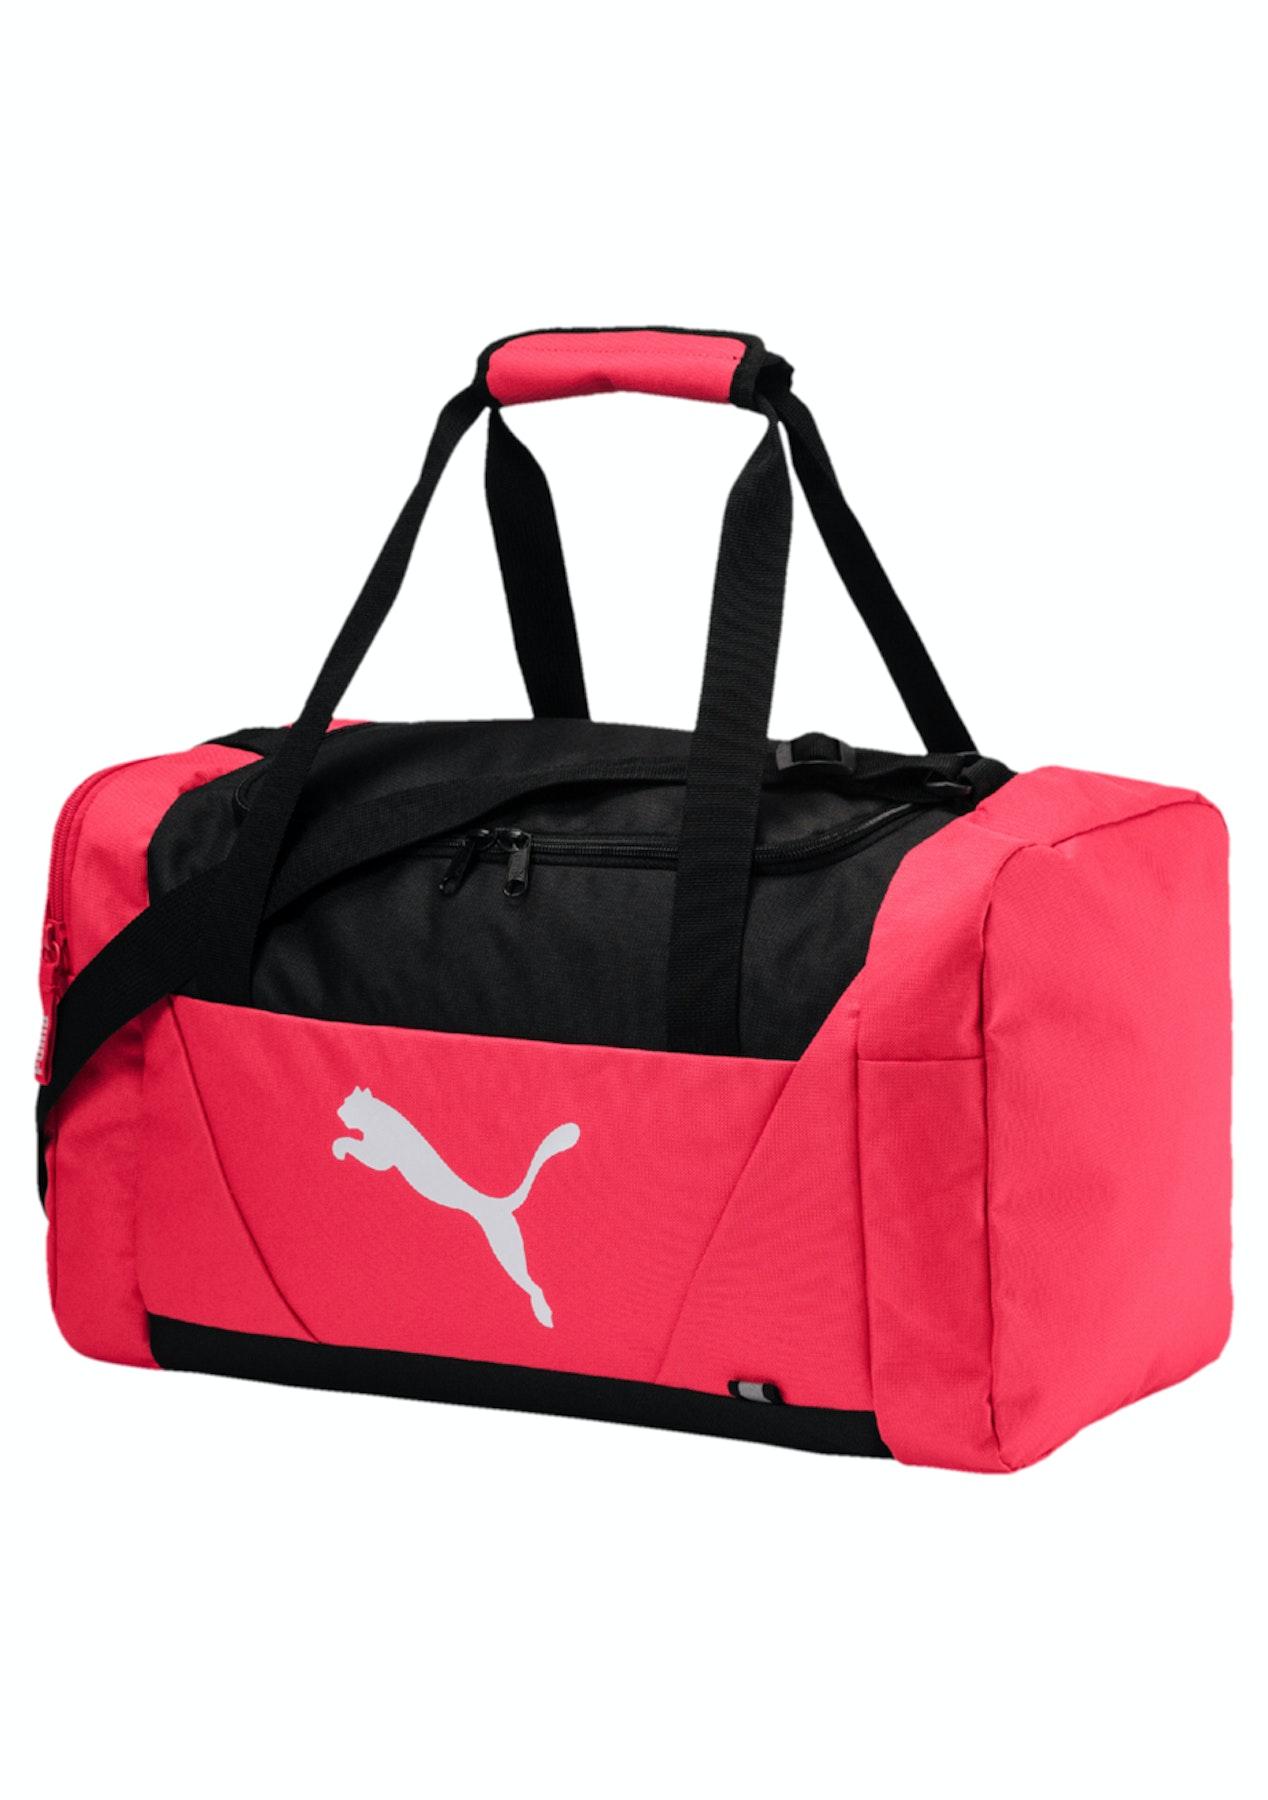 Puma Womens - Fundamentals Sports Bag S Pink - Puma Womens   Kids Up to 60%  Off - Onceit 8e1d5724a21a0